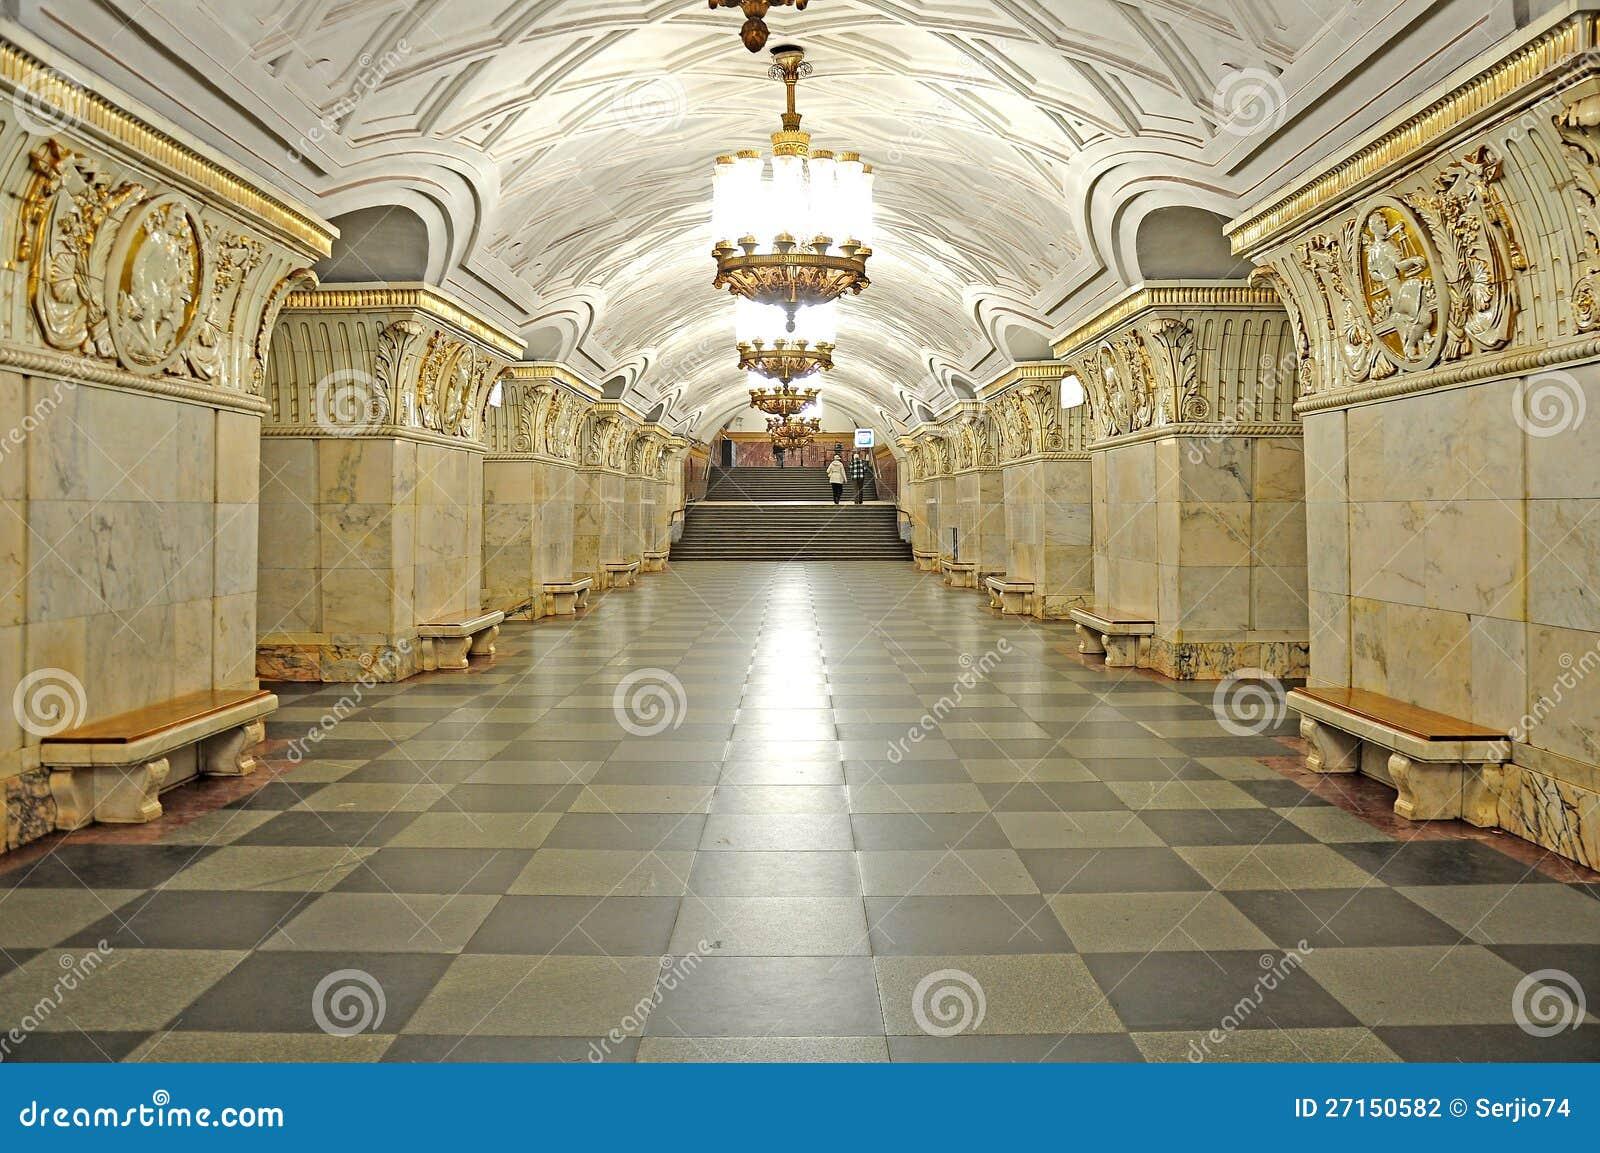 metro in moskau stockfotografie bild 27150582. Black Bedroom Furniture Sets. Home Design Ideas